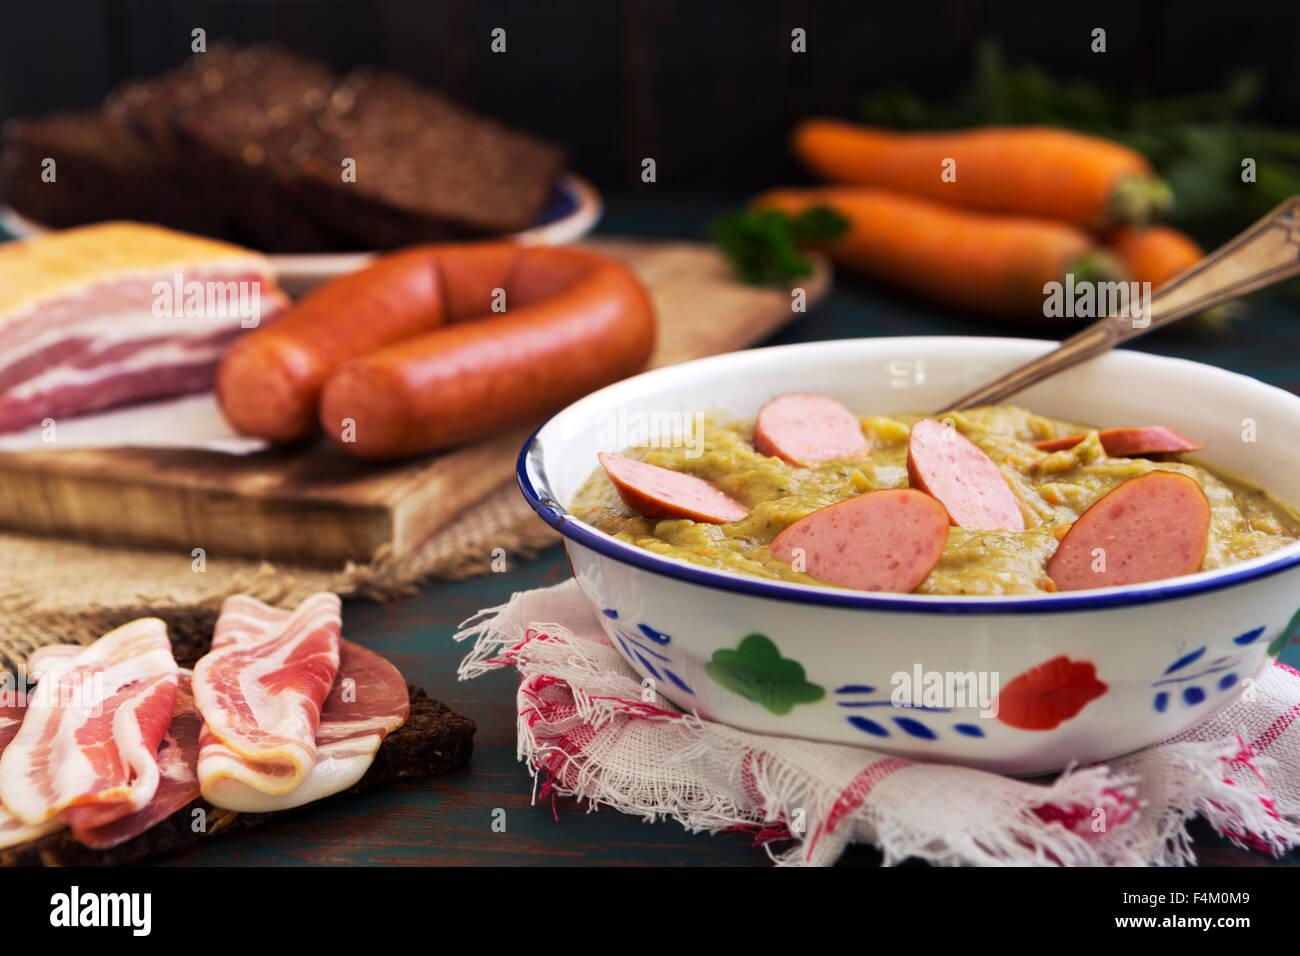 "Abundante holandés tradicional sopa de guisantes con salchicha ahumada, pan de centeno y tocino. O: ""rookworst roggebrood Foto de stock"